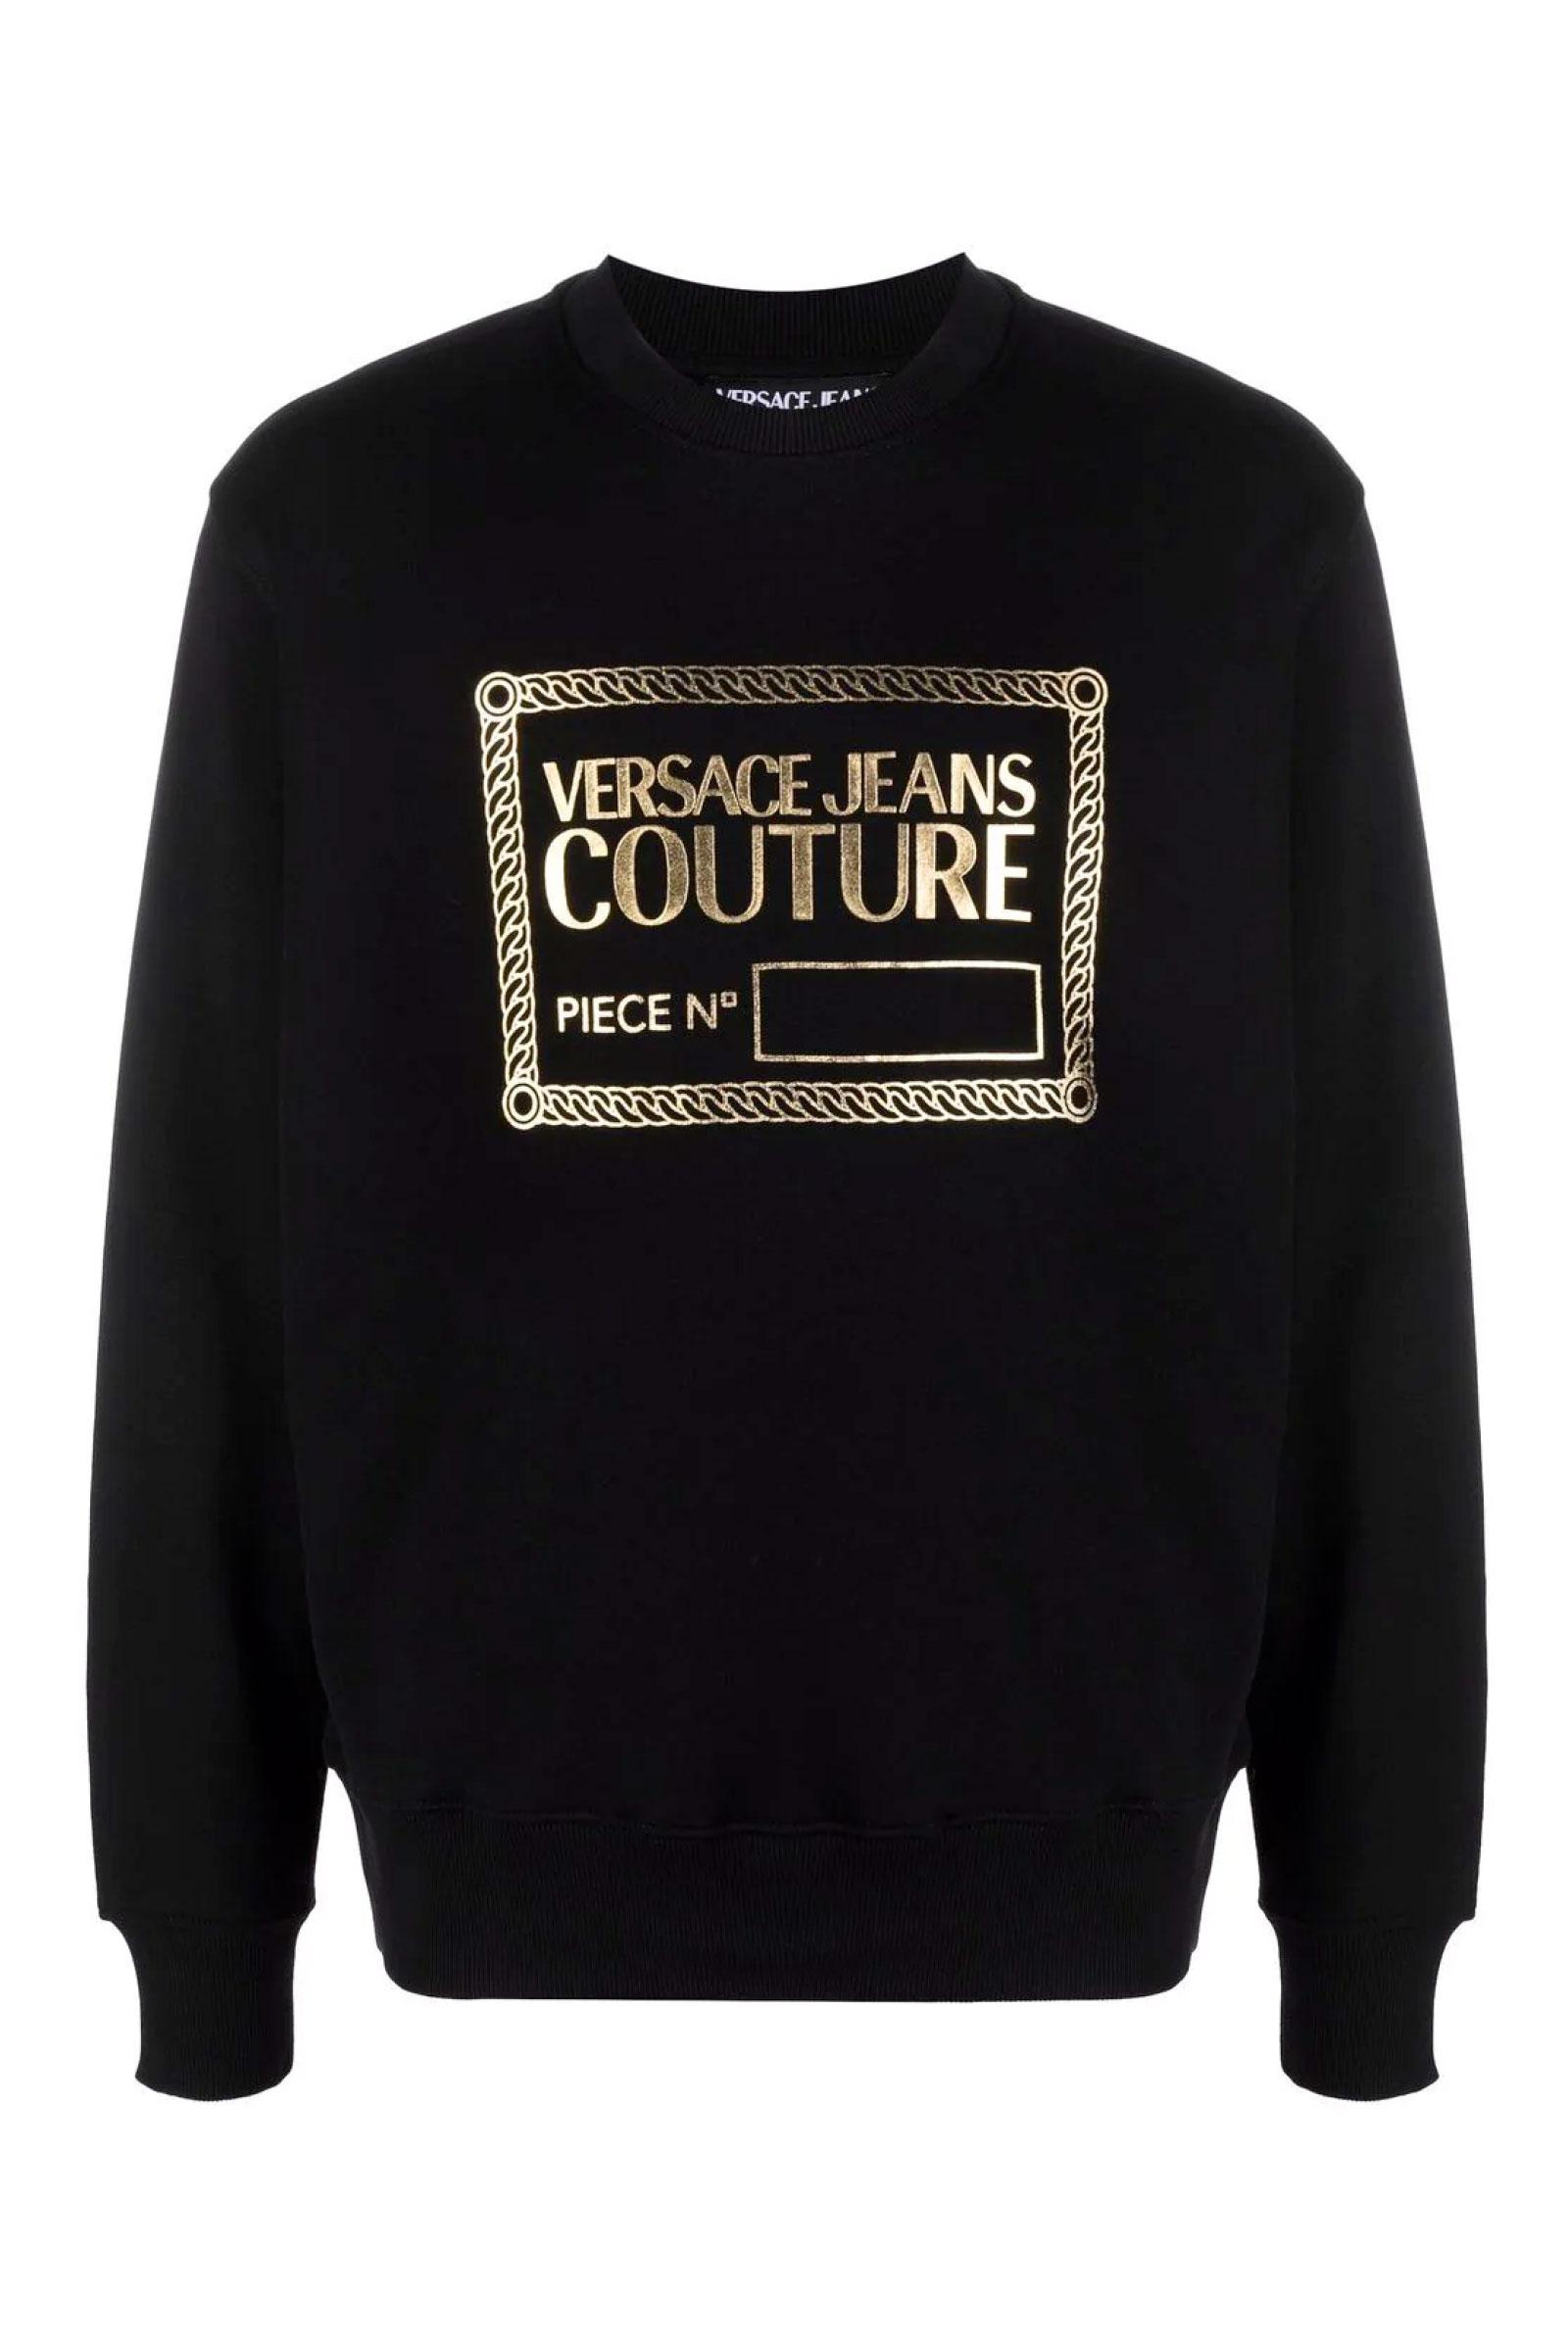 VERSACE JEANS COUTURE   Sweatshirt   71GAIT15 CF00TG89